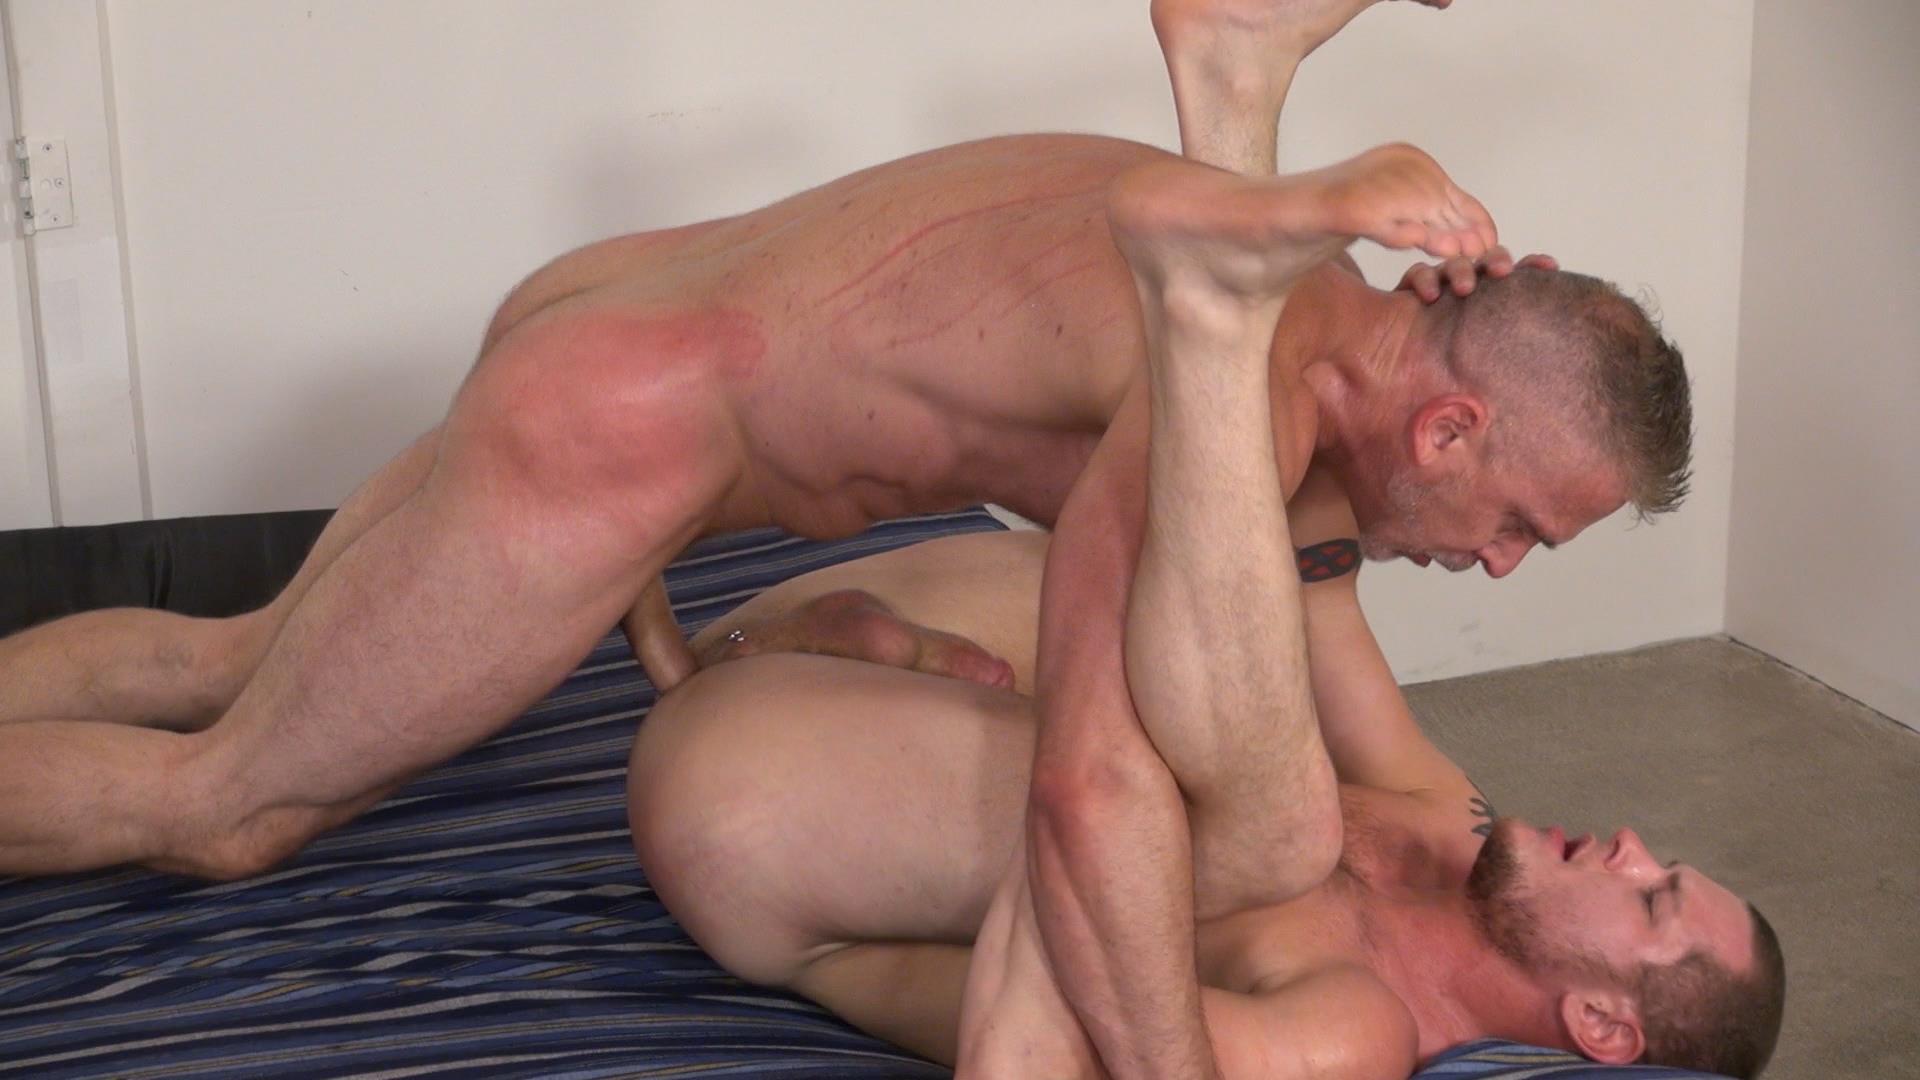 Raw and Rough Sam Dixon and Blue Bailey Daddy And Boy Flip Flip Bareback Fucking Amateur Gay Porn 07 Blue Bailey Flip Flop Barebacking With A Hung Daddy